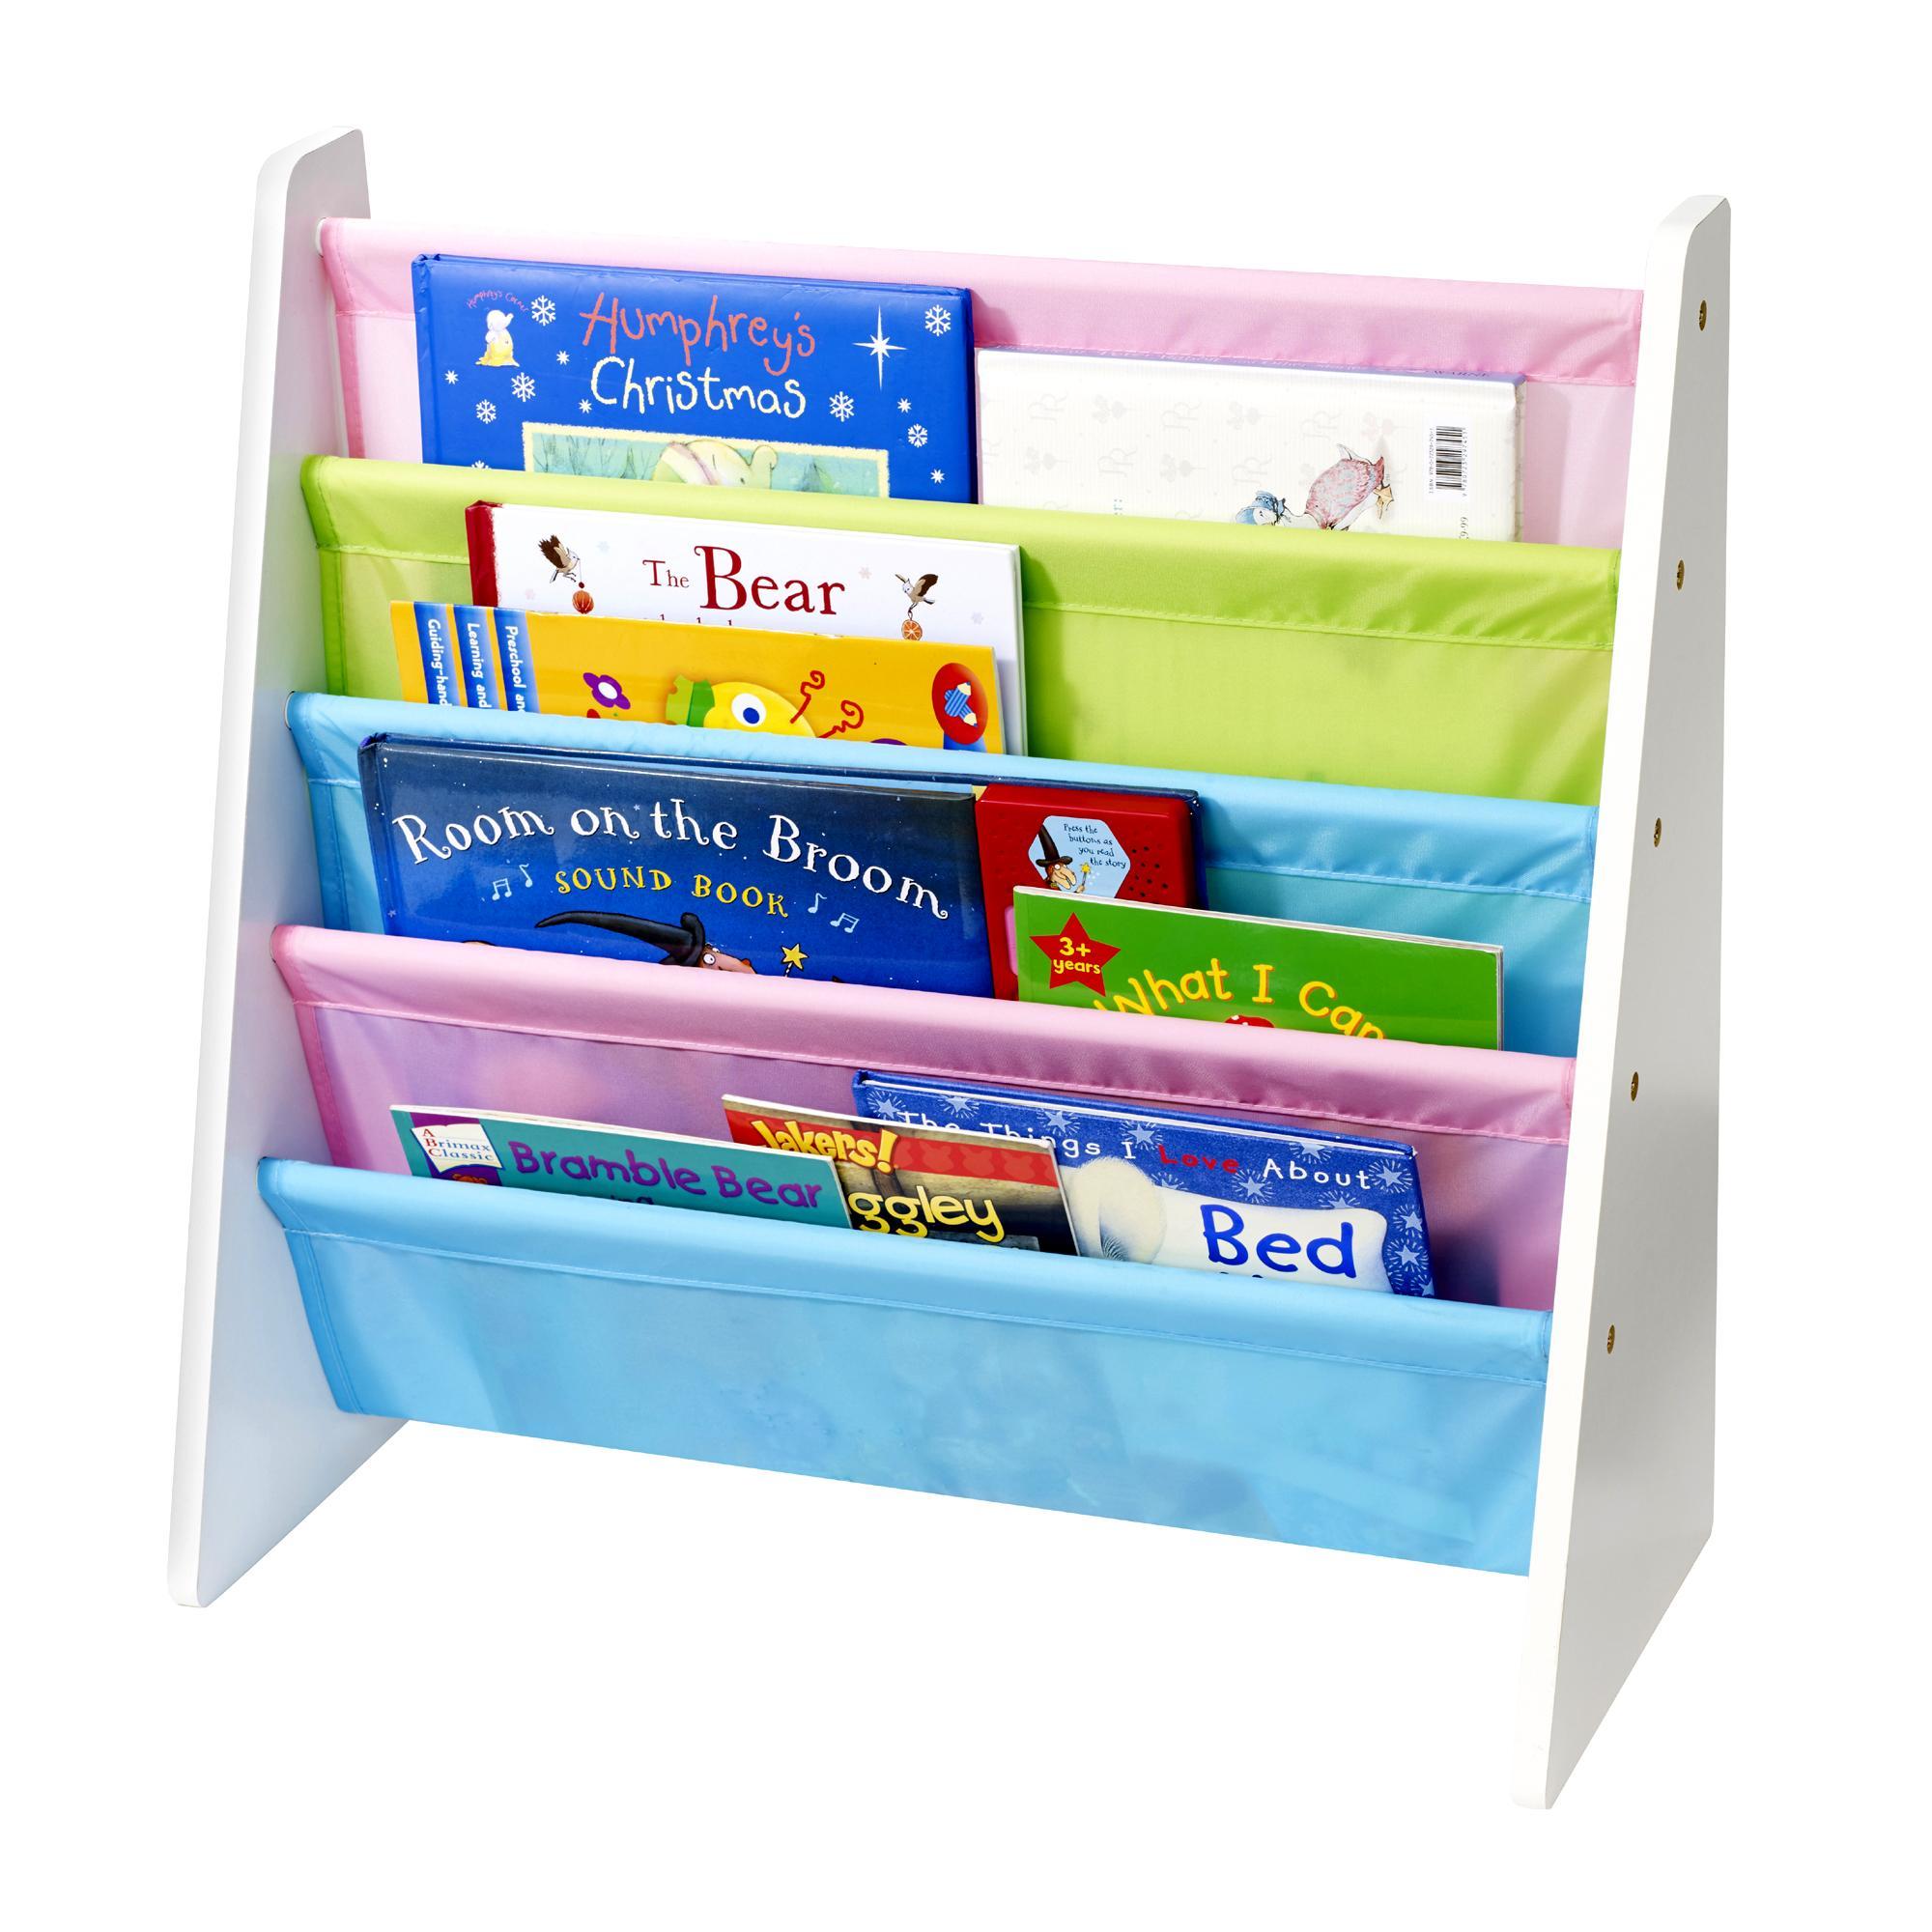 New Bookcase Toy Box White Finish Bedroom Playroom Child: Childrens/Kids Wooden Bookcase Rack Storage Book-Shelf